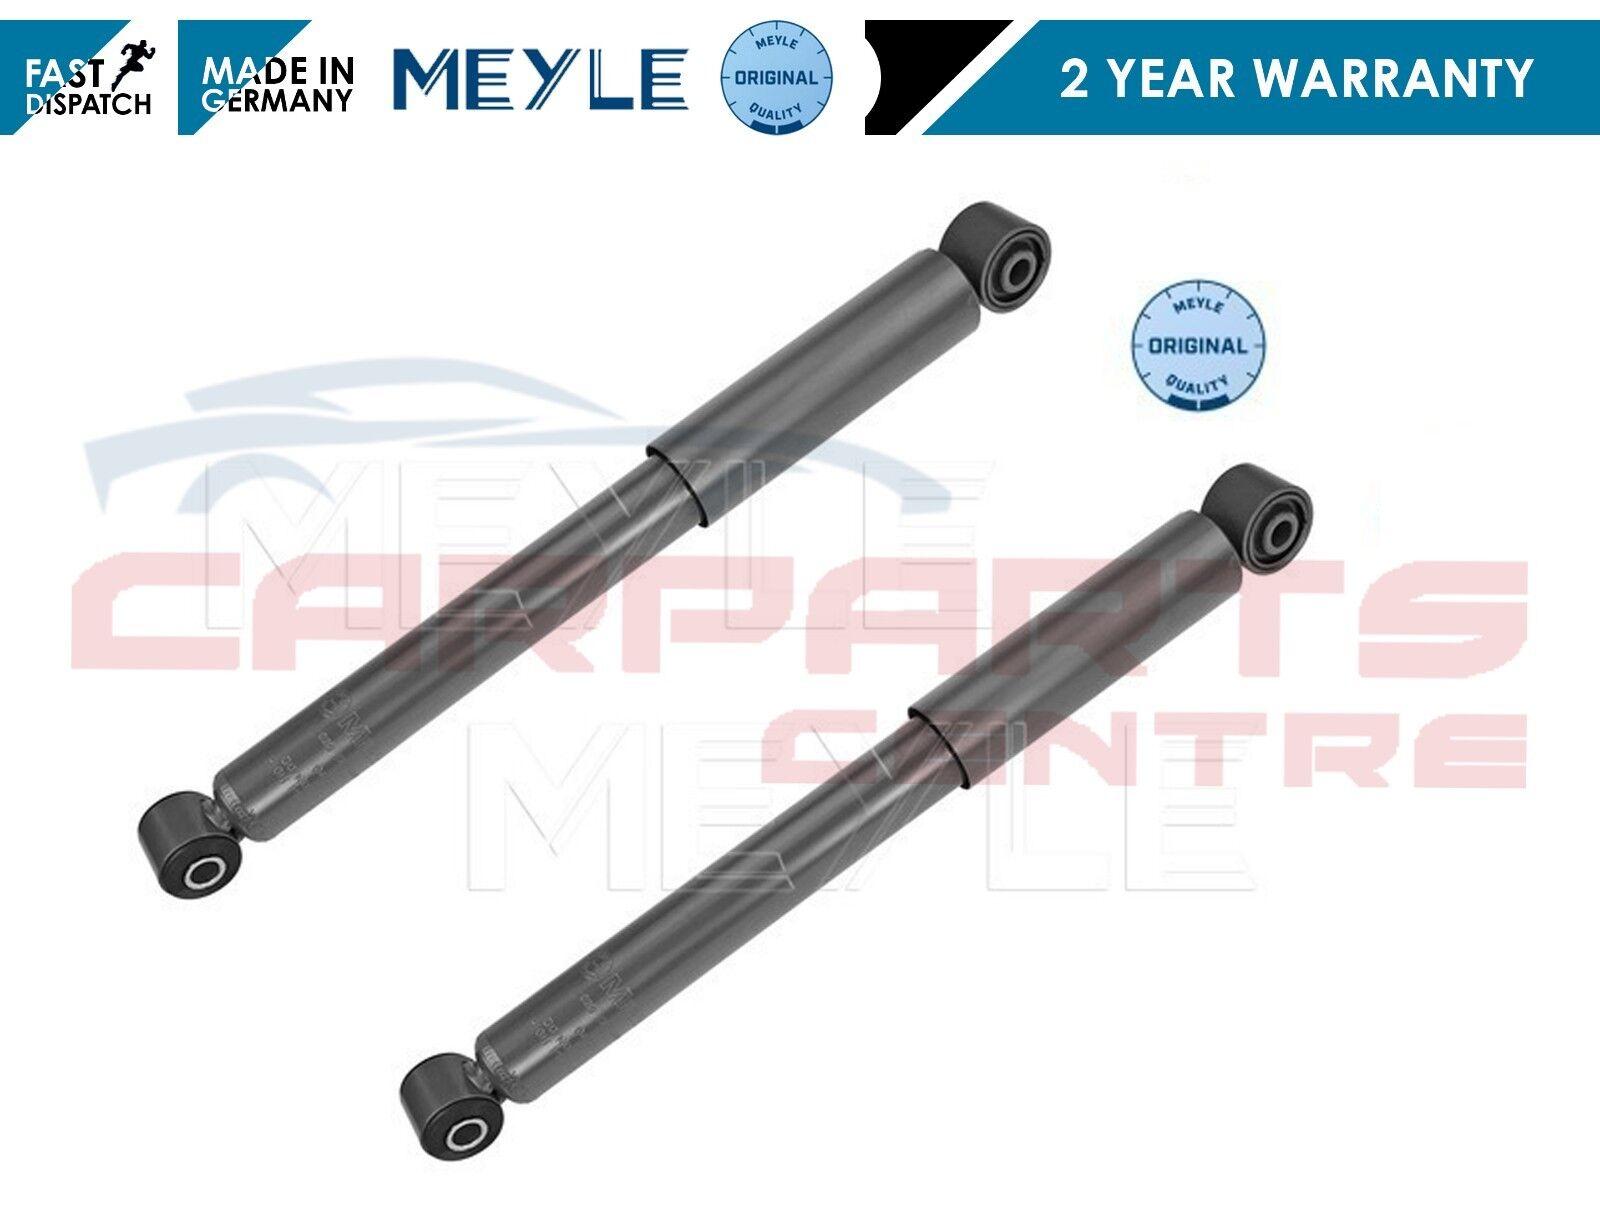 Mercedes Vito Front Coil Spring Part Pair Set W638 108 110 1996-2003